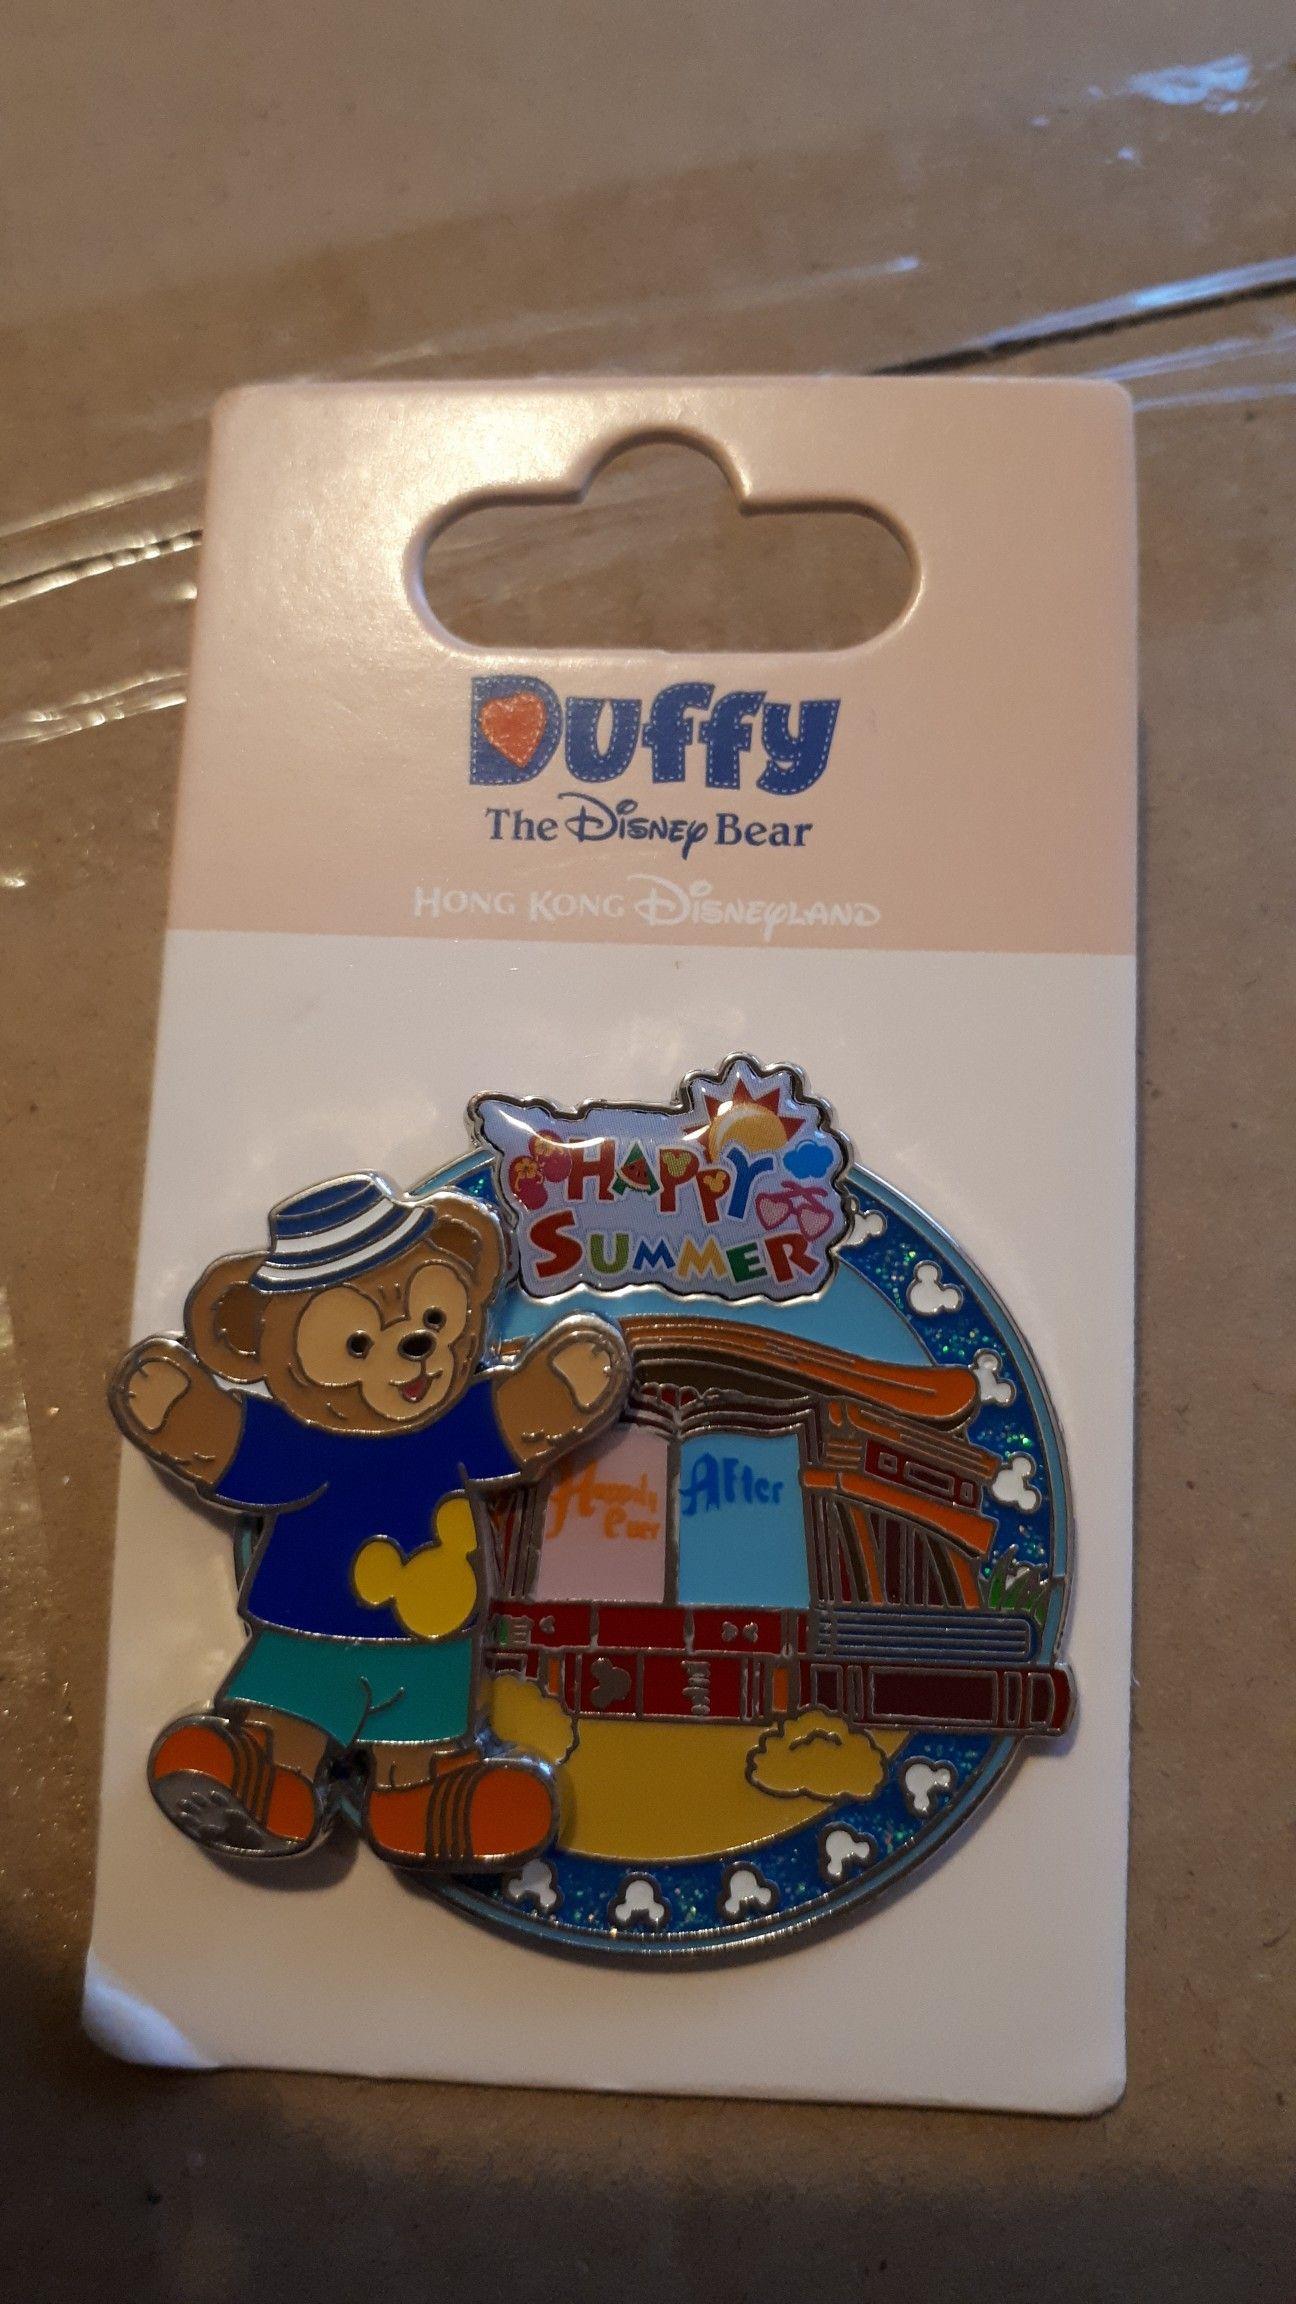 Pin on Duffy The Disney Bear